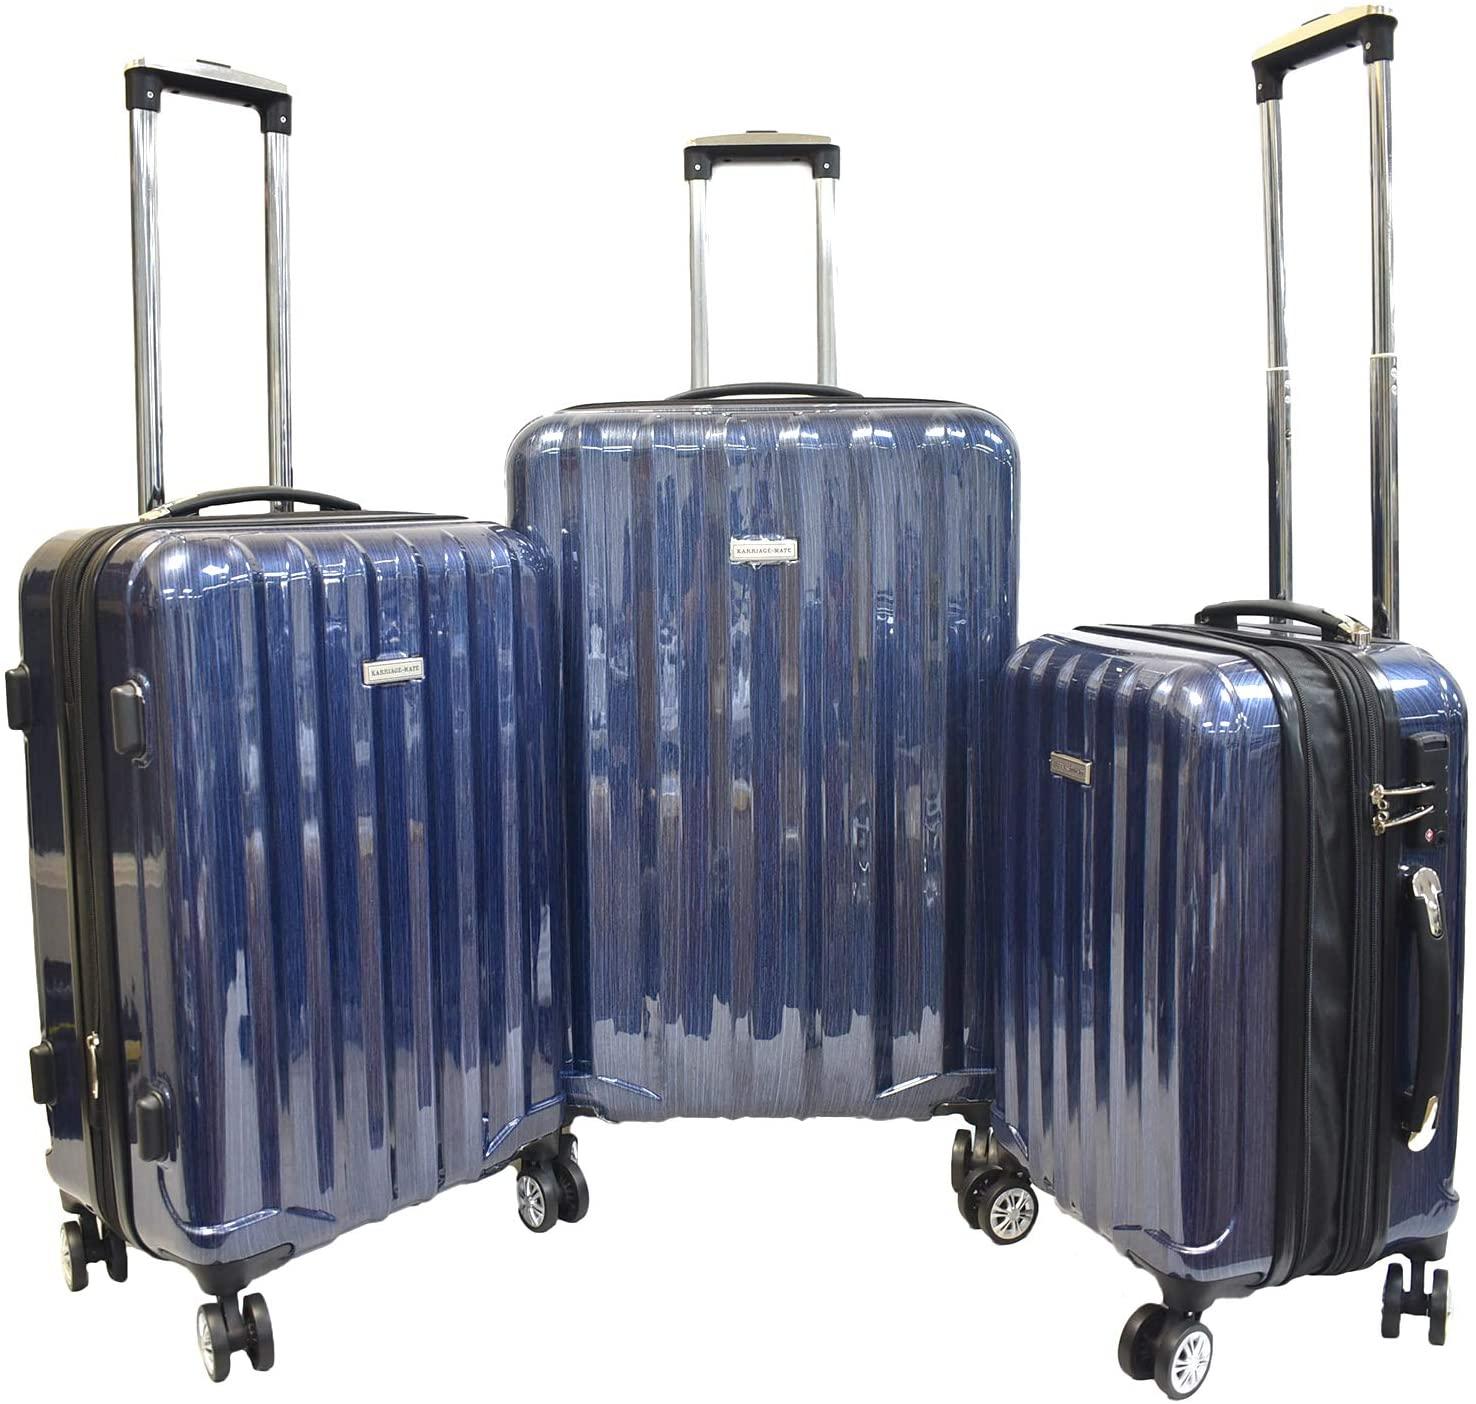 Karriage-Mate Hardside Expandable Luggage with Spinner Wheels, TSA Lock (Blue)